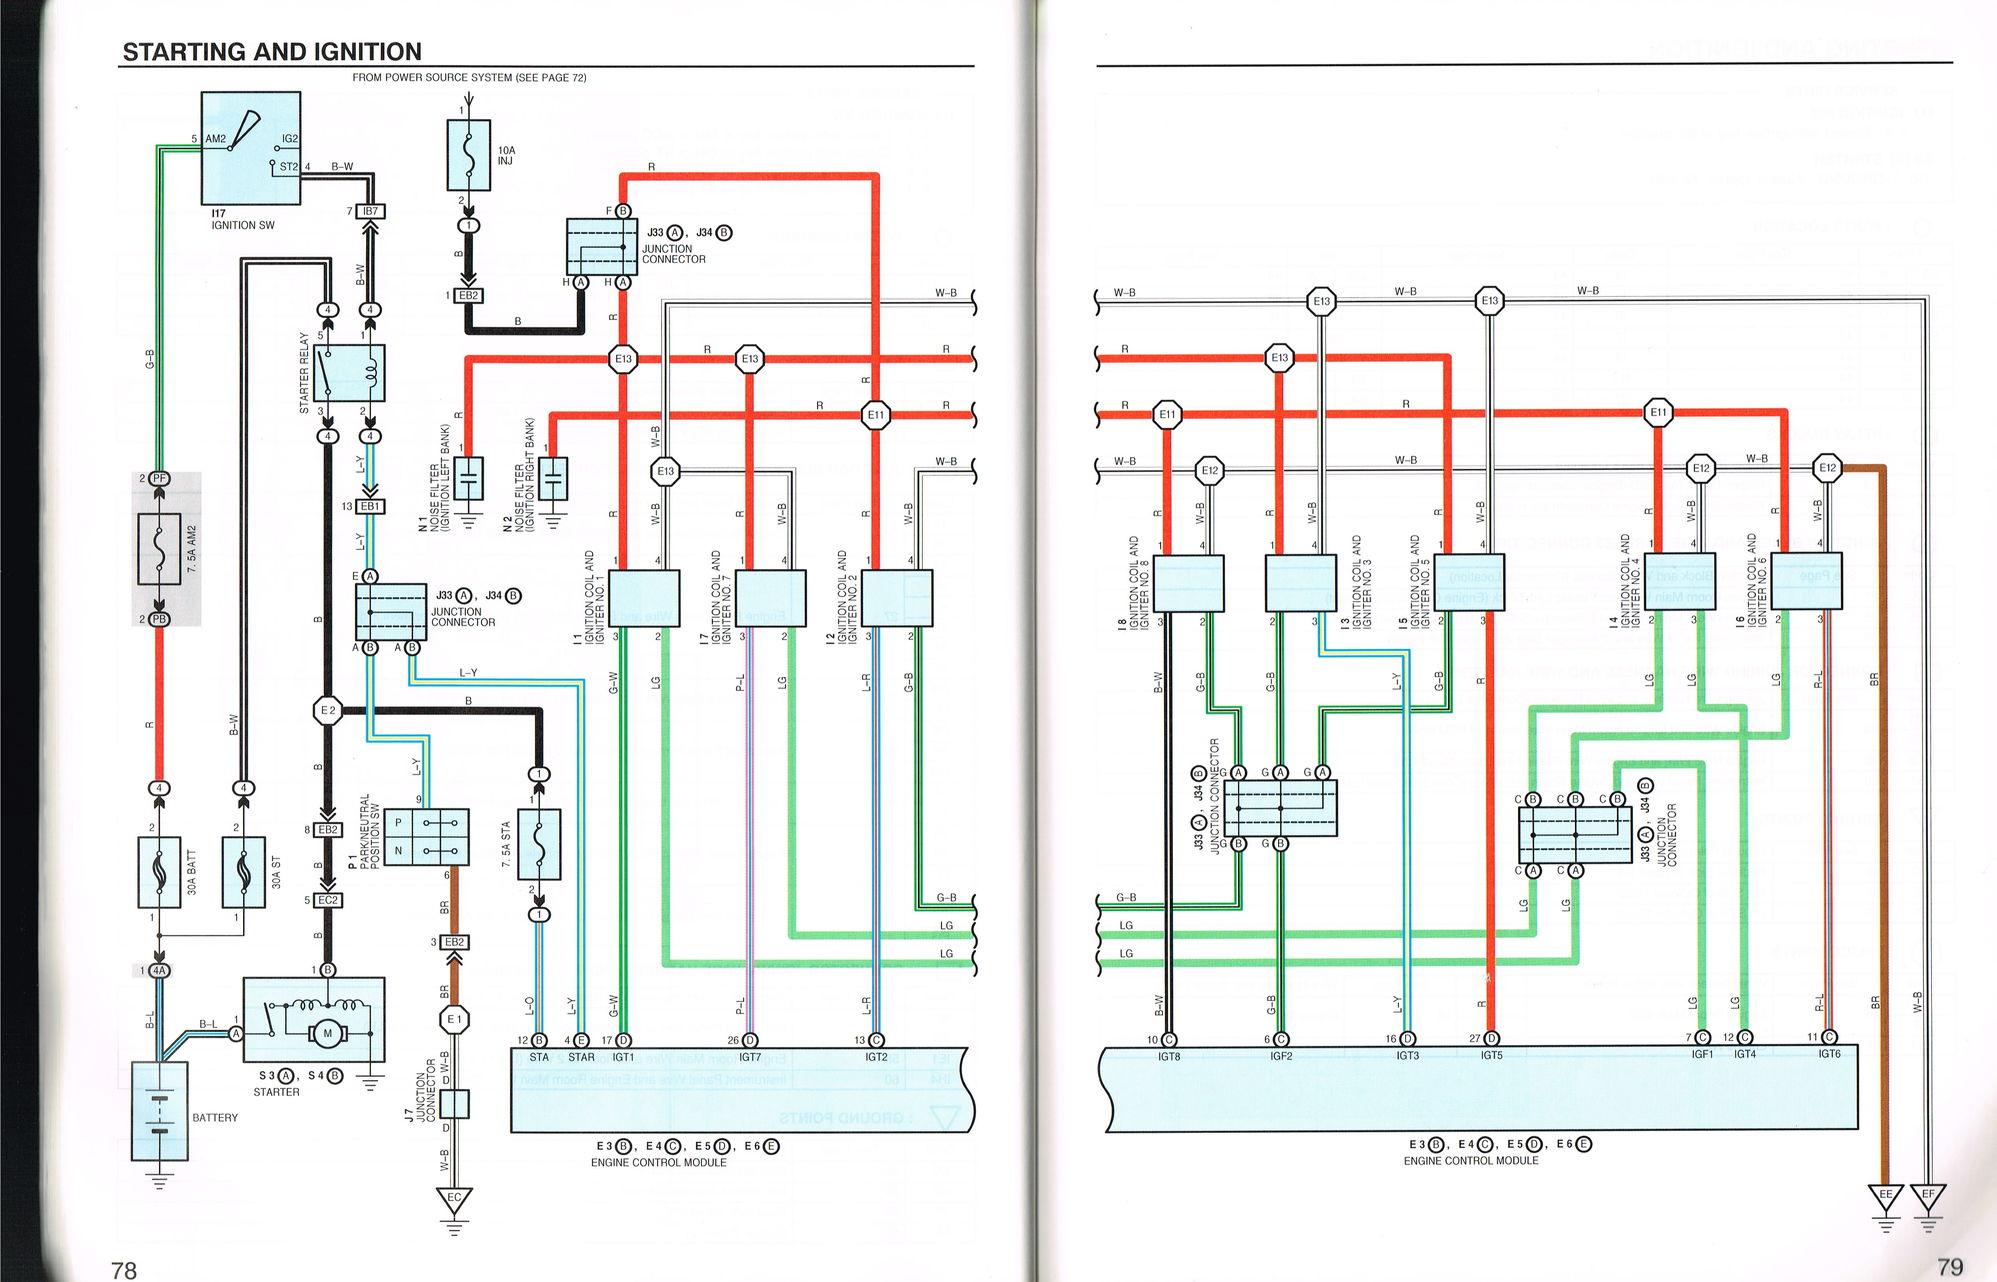 lexus is300 o2 sensor diagram rabbit meat mark levinson wiring get free image